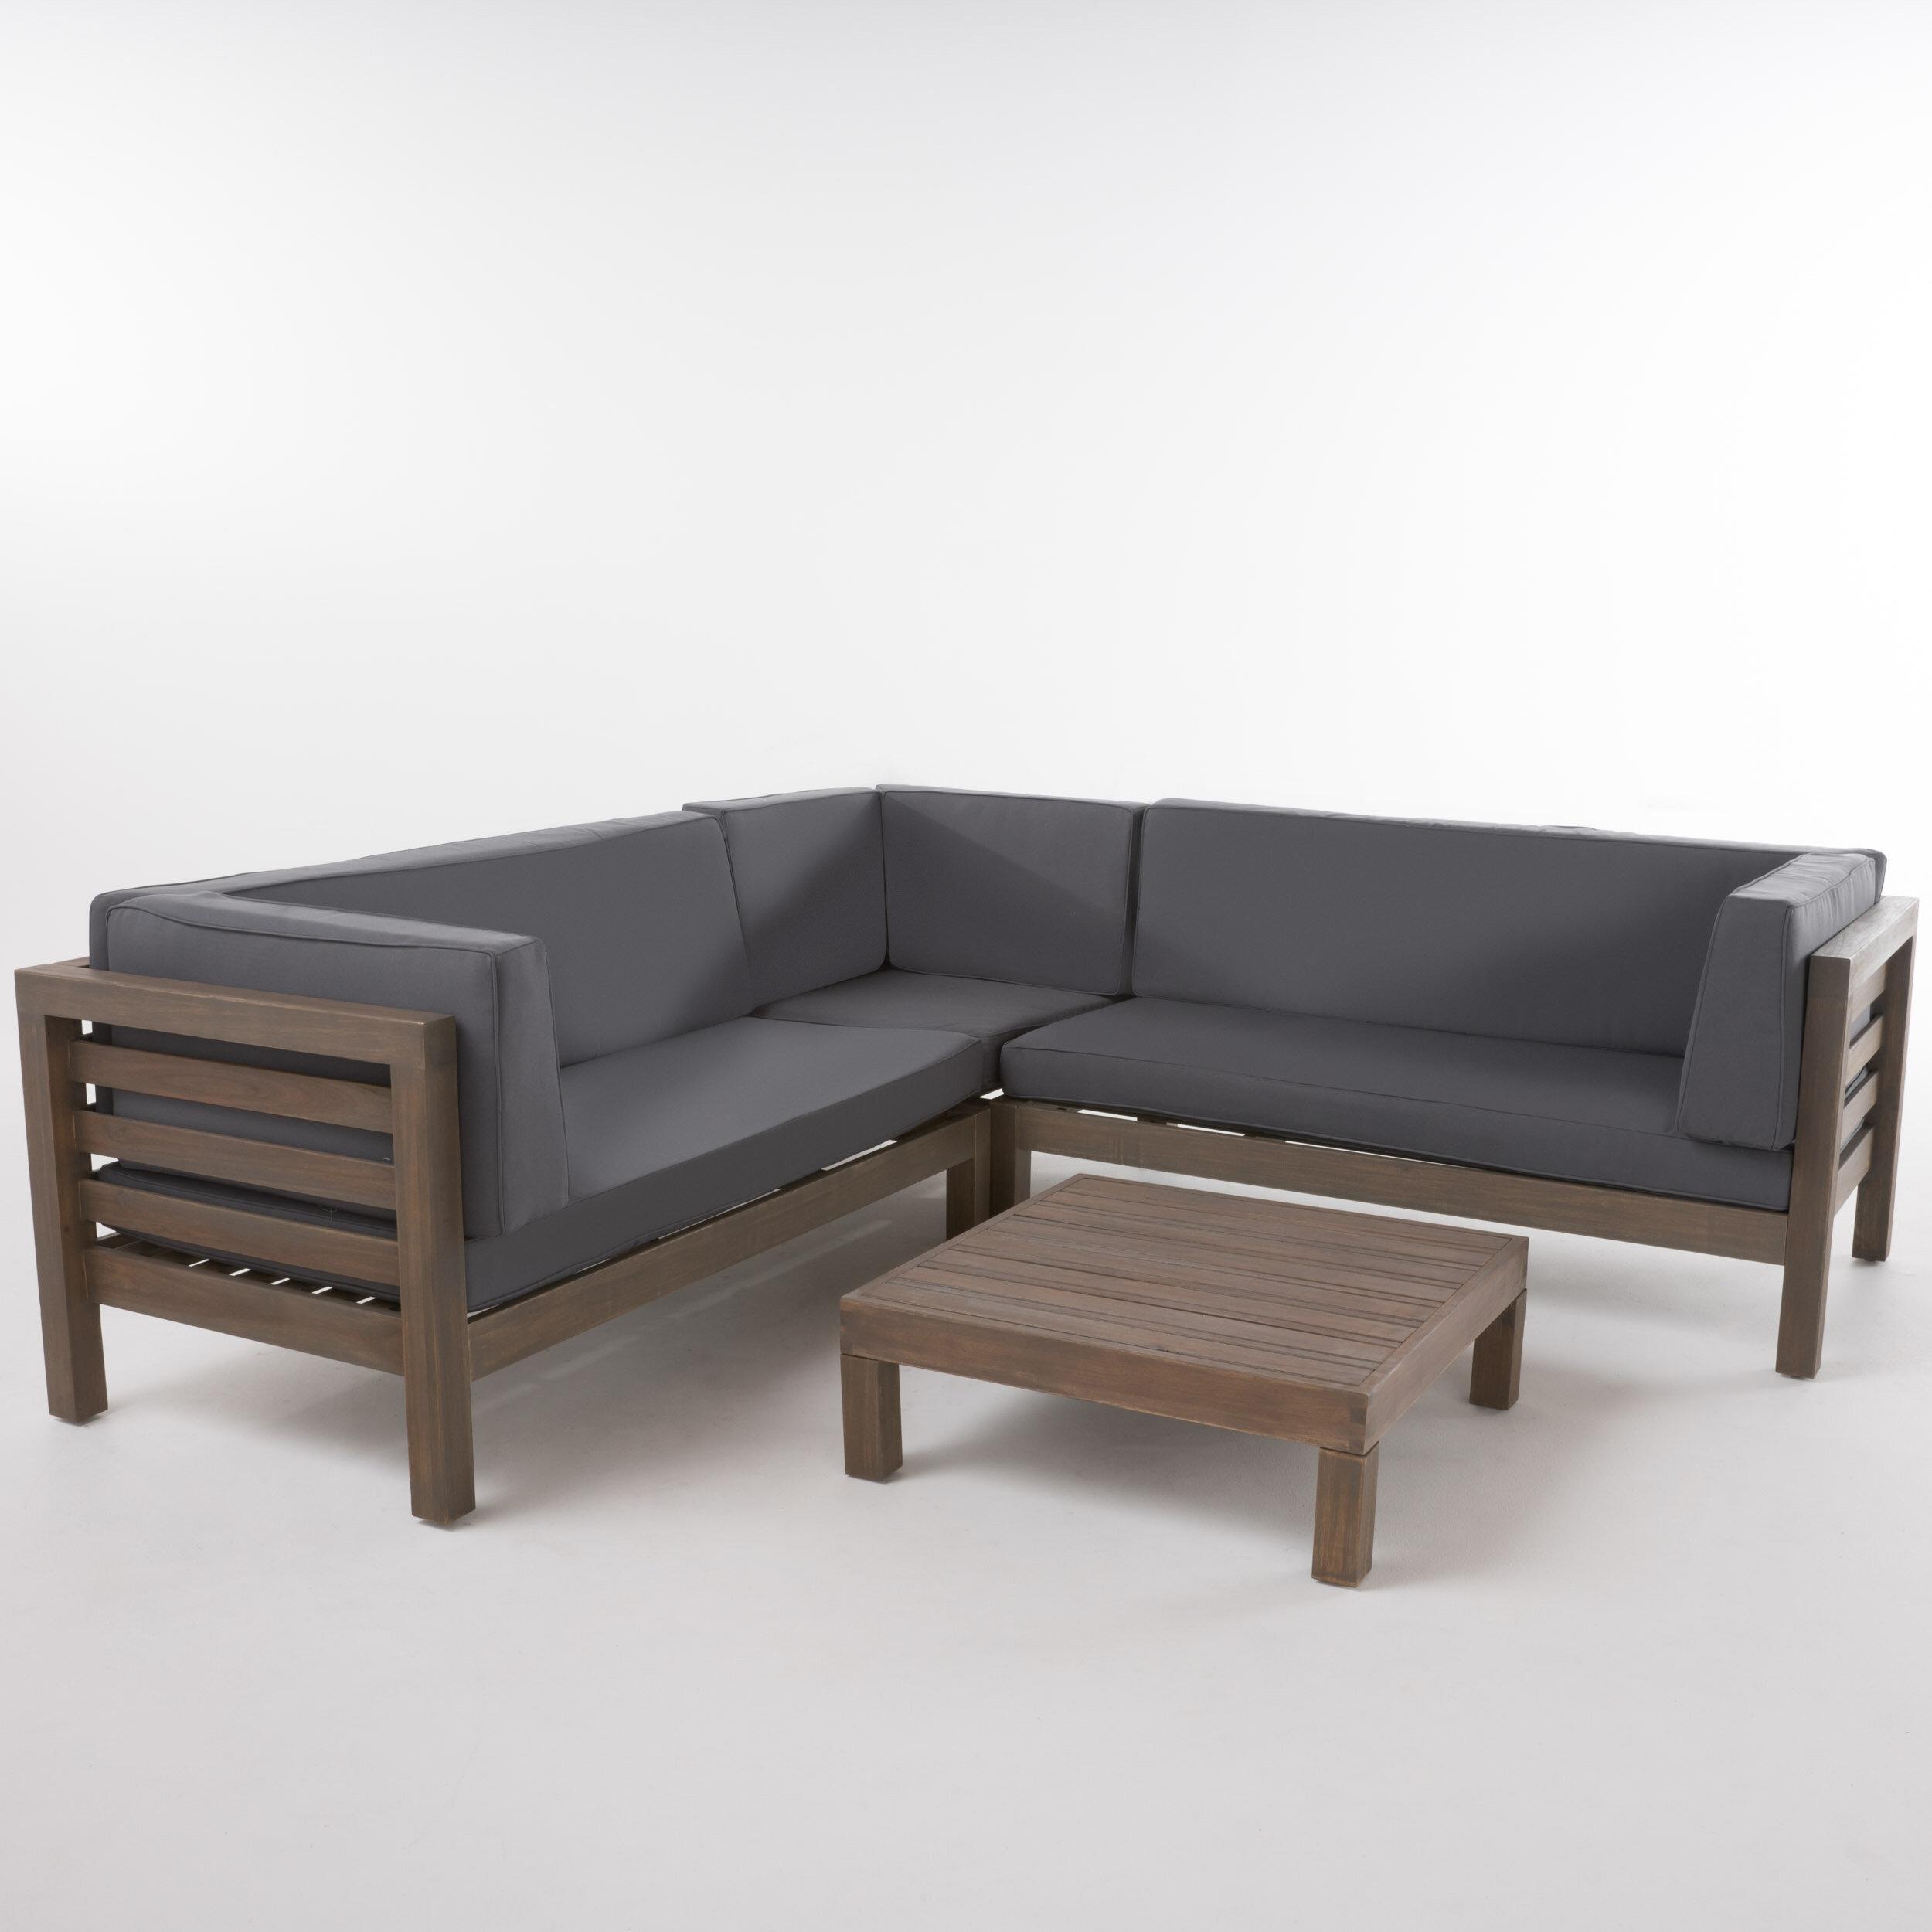 Gracie Oaks Birdsboro 4 Piece Sectional Set With Cushions U0026 Reviews |  Wayfair